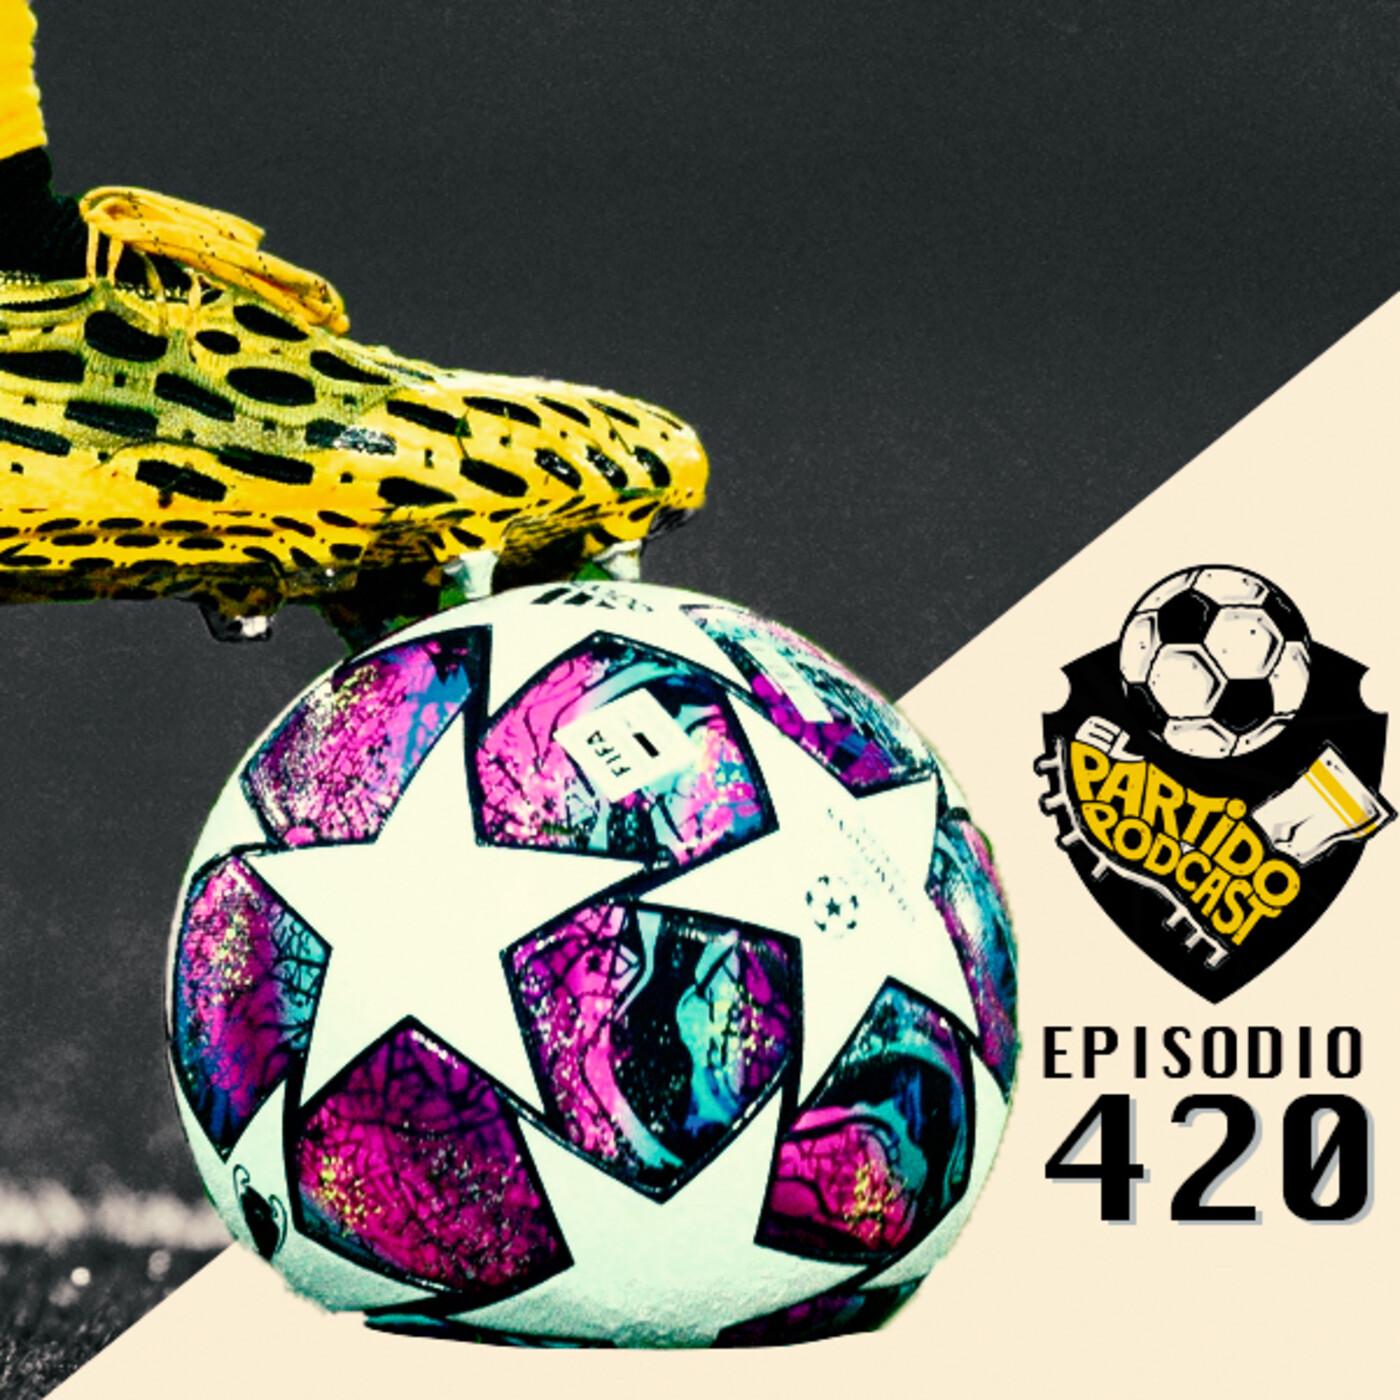 Ep 420: Análisis del sorteo de la UEFA Champions League